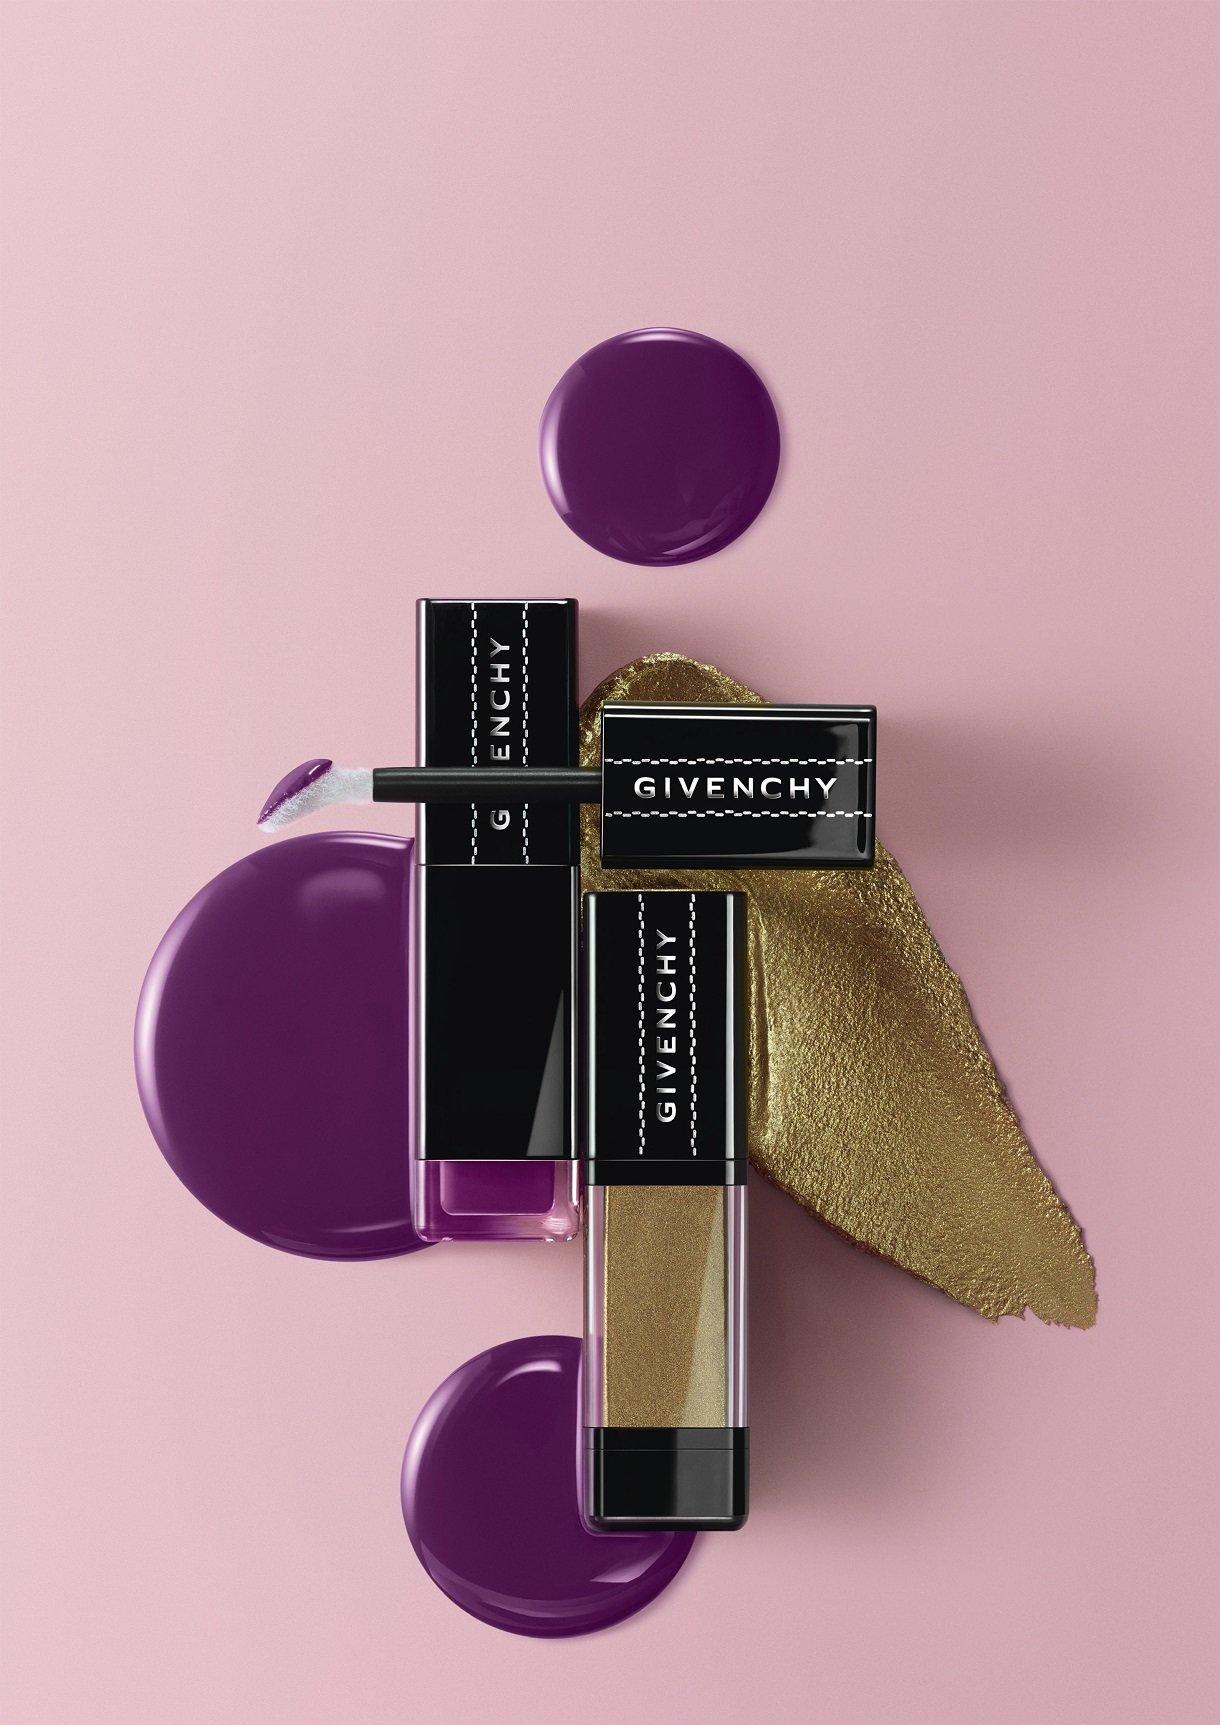 Givenchy Beauty - Encre Interdite - Campaign Shot 5.jpg